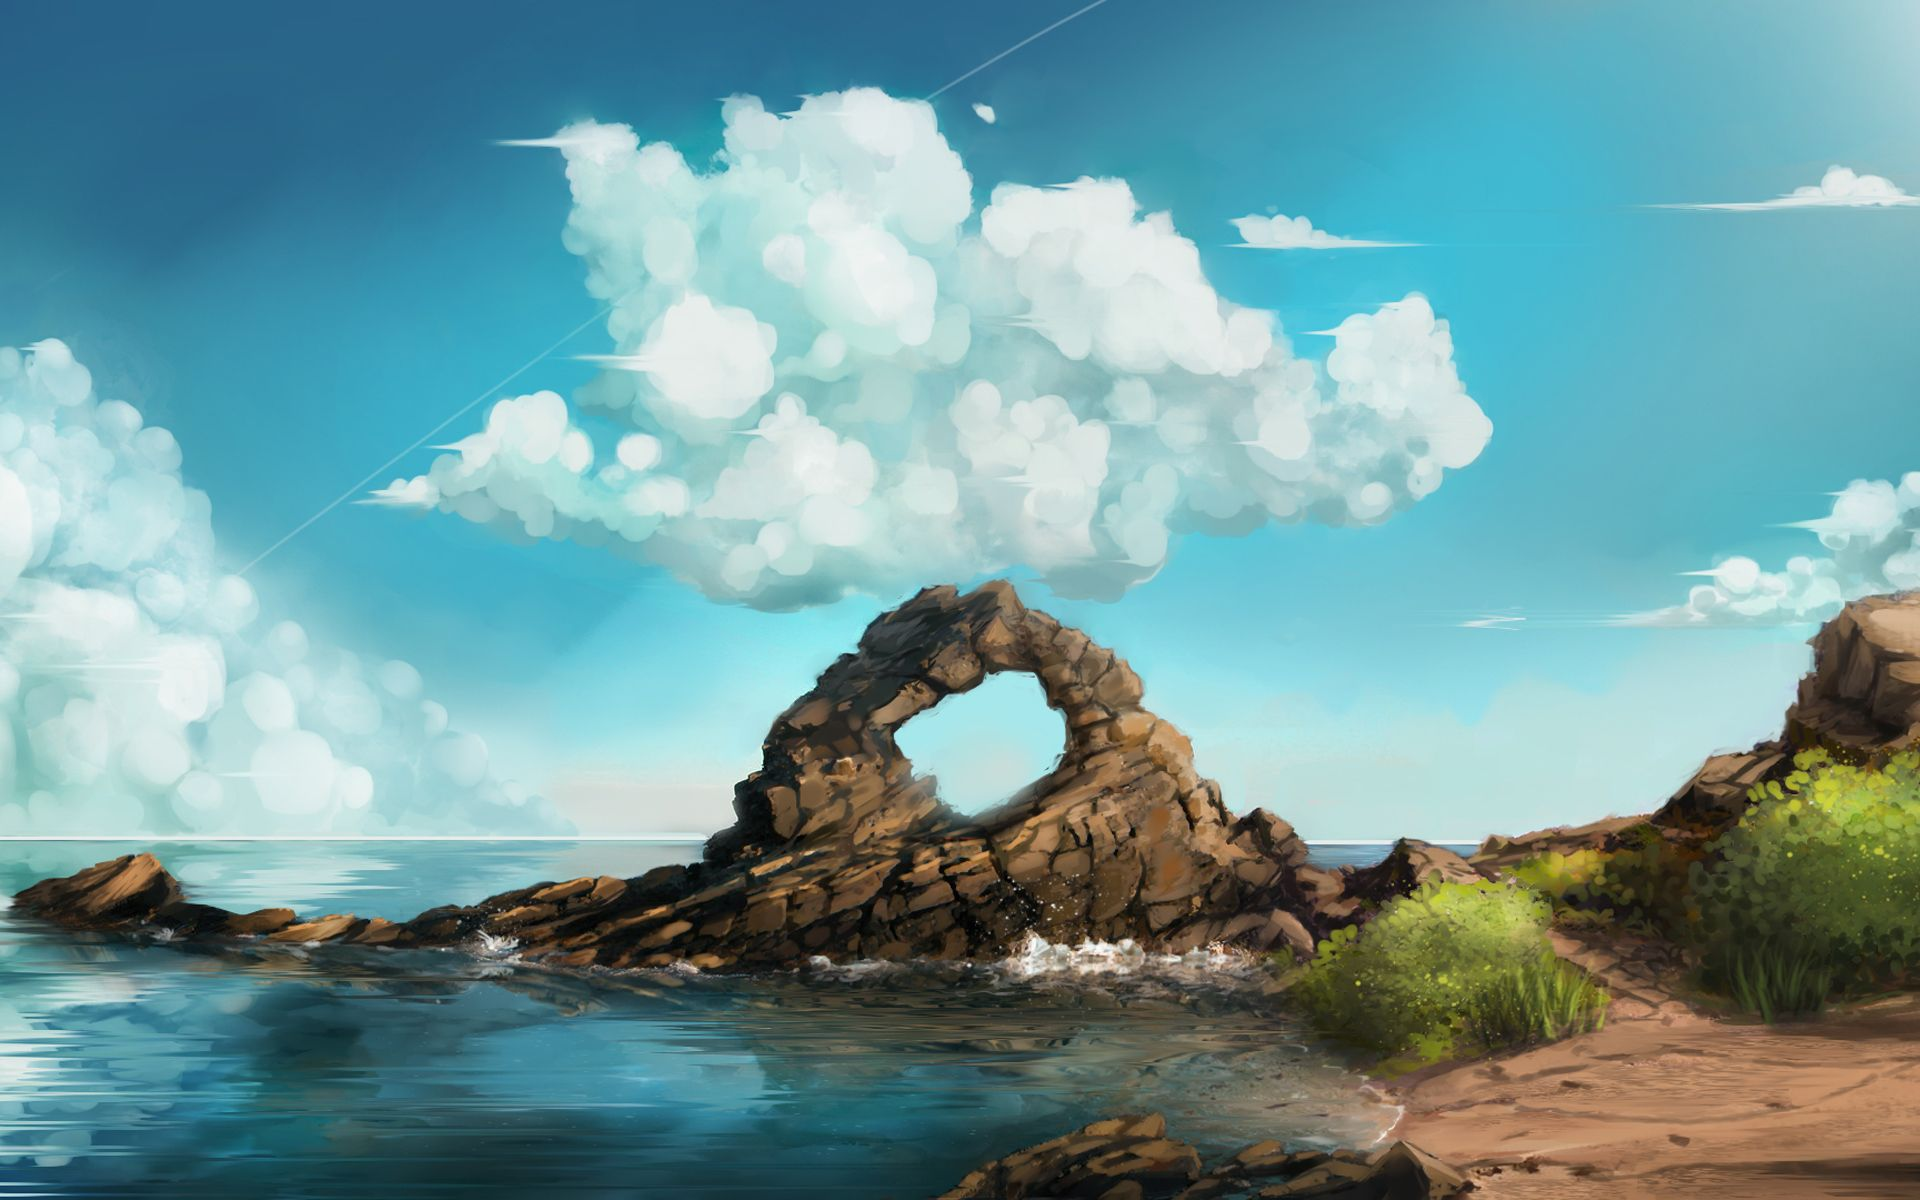 Clouds Sky Art Rocks Sea Clouds Sky Art Rocks Sea Is An Hd Desktop Wallpaper Posted